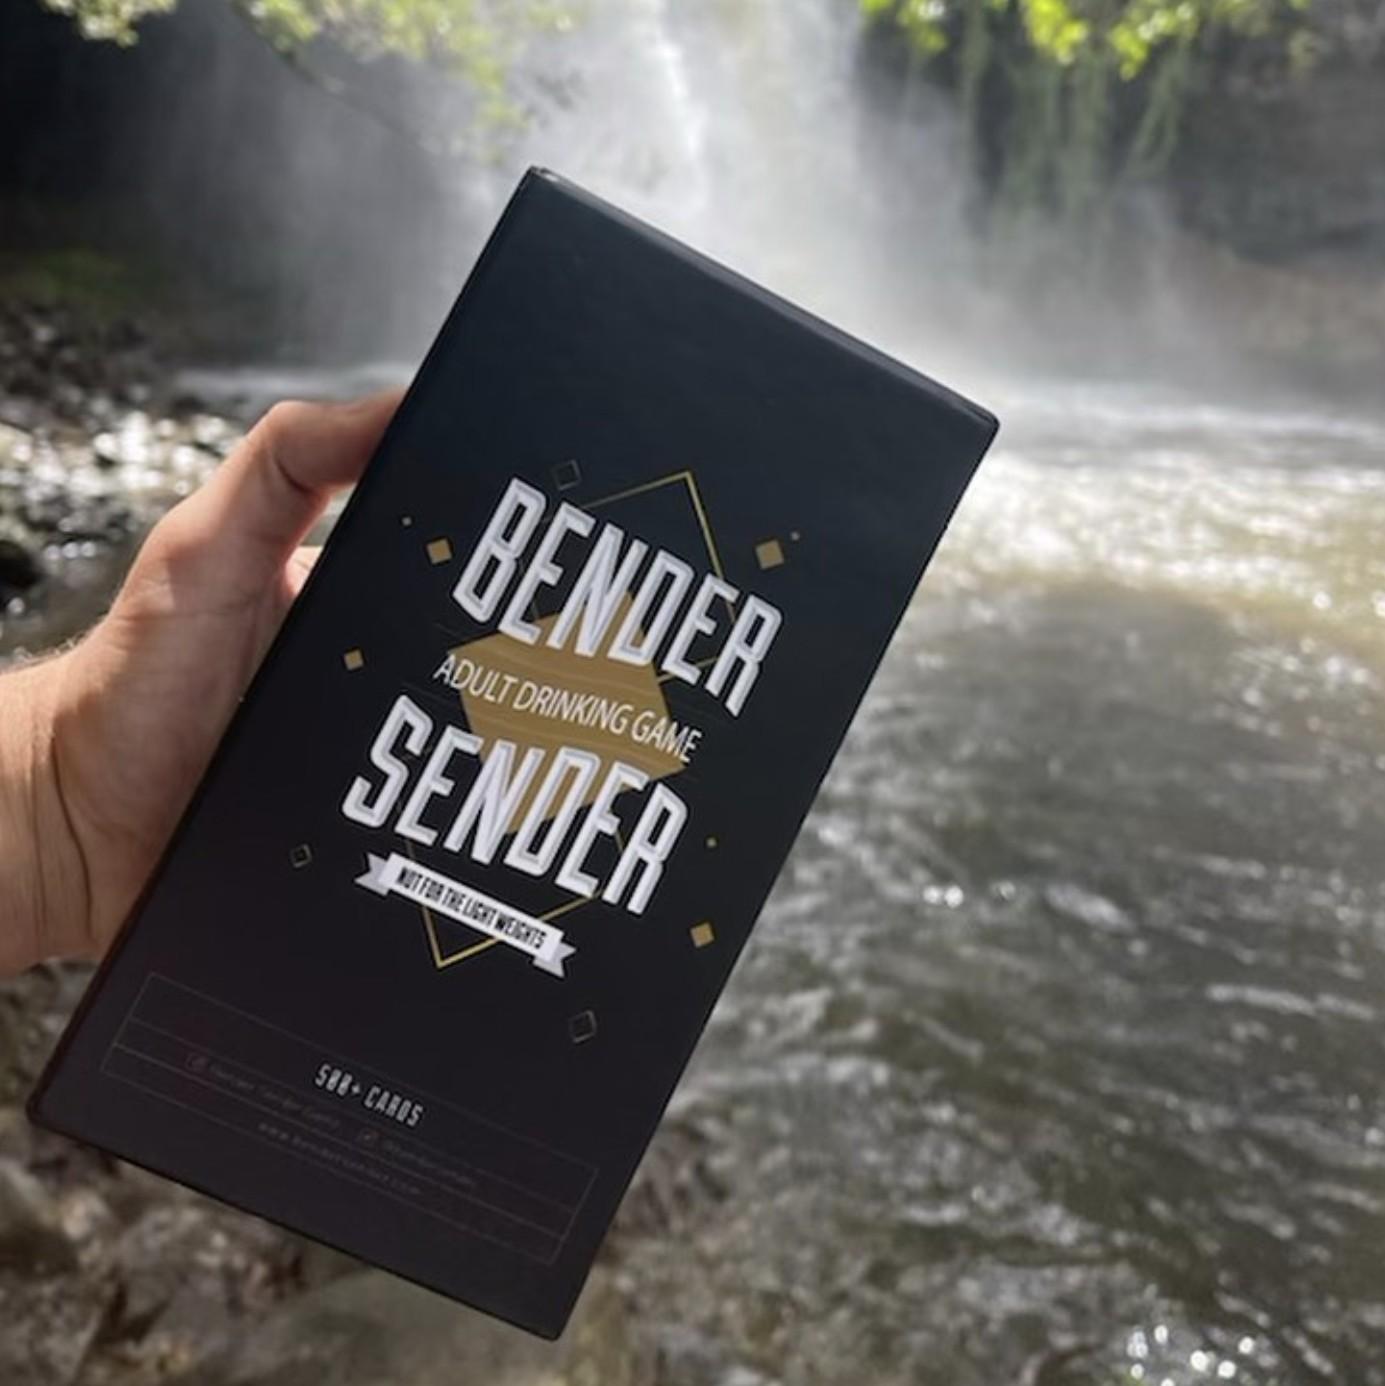 BENDER SENDER DRINKING GAME